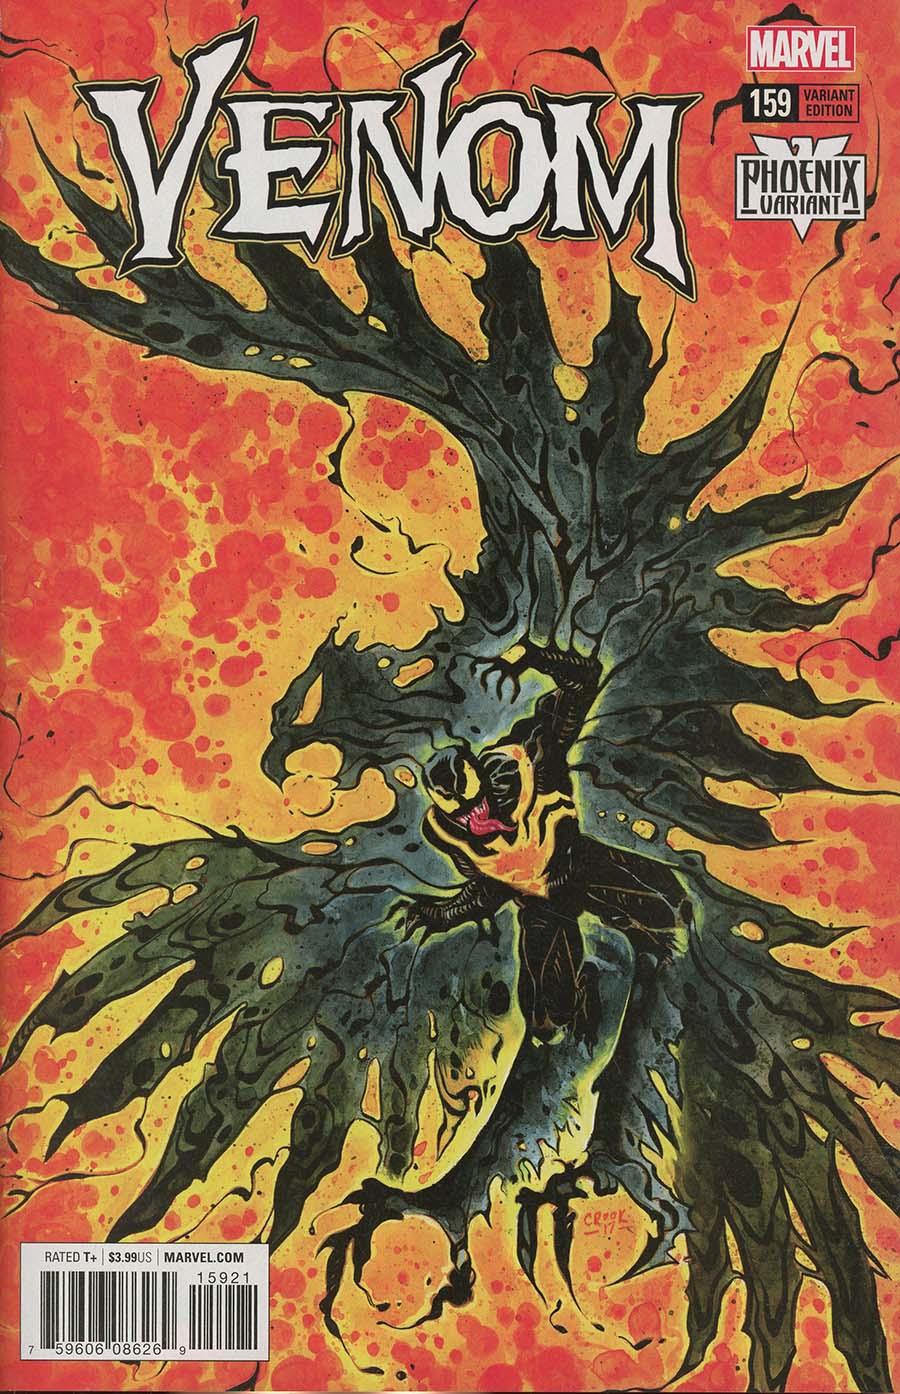 Venom Vol 3 #159 Cover B Variant Tyler Crook Phoenix Cover